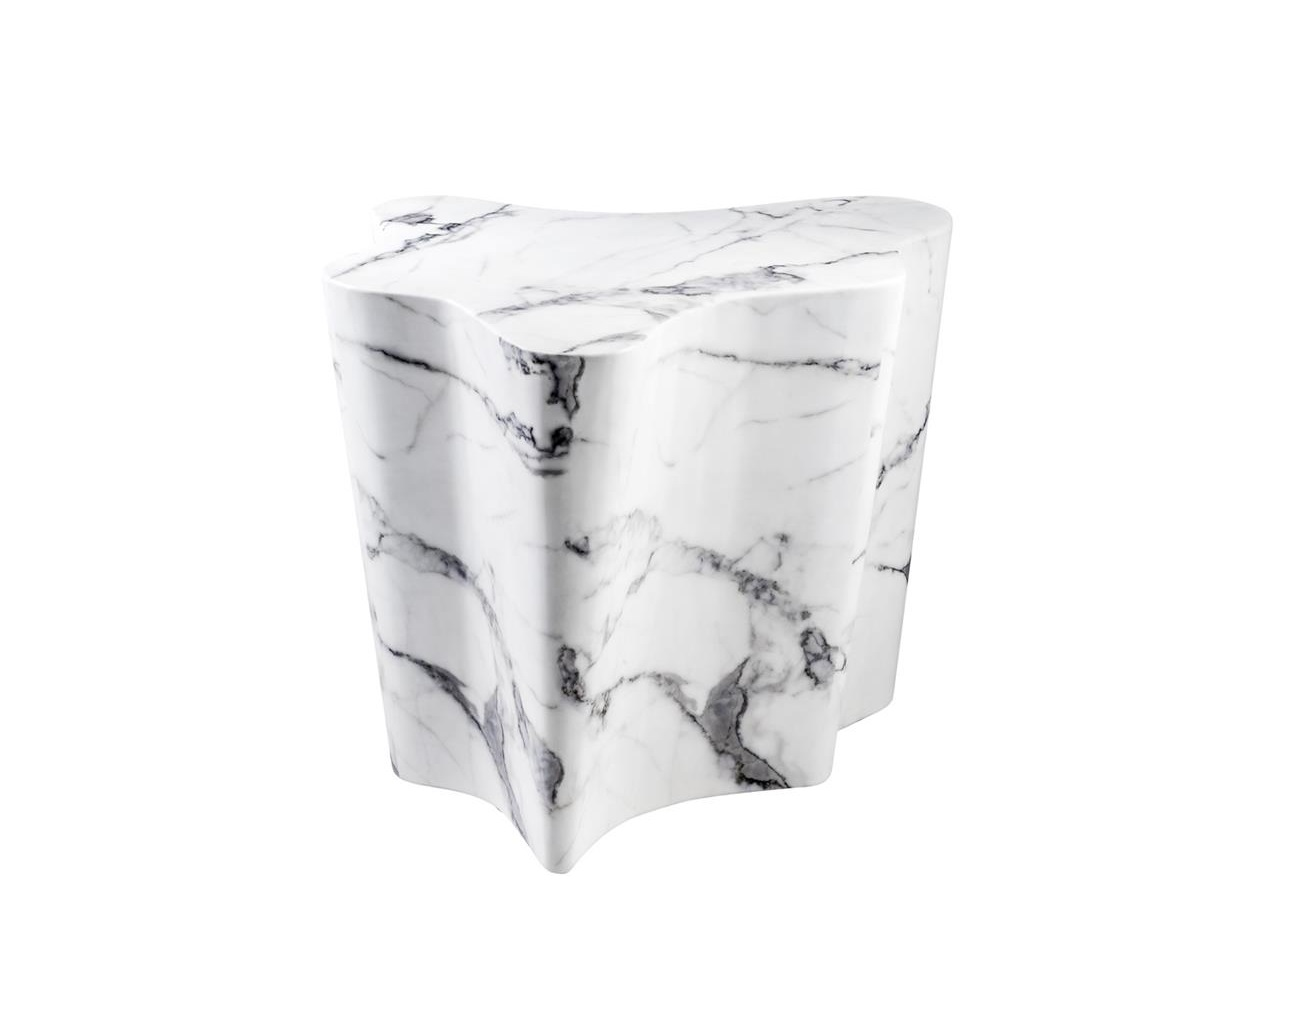 СтолПриставные столики<br>Столик Side Table Sceptre с имитацией мрамора глянцевого белого цвета.<br><br>Material: Мрамор<br>Ширина см: 68.0<br>Высота см: 56.0<br>Глубина см: 62.0